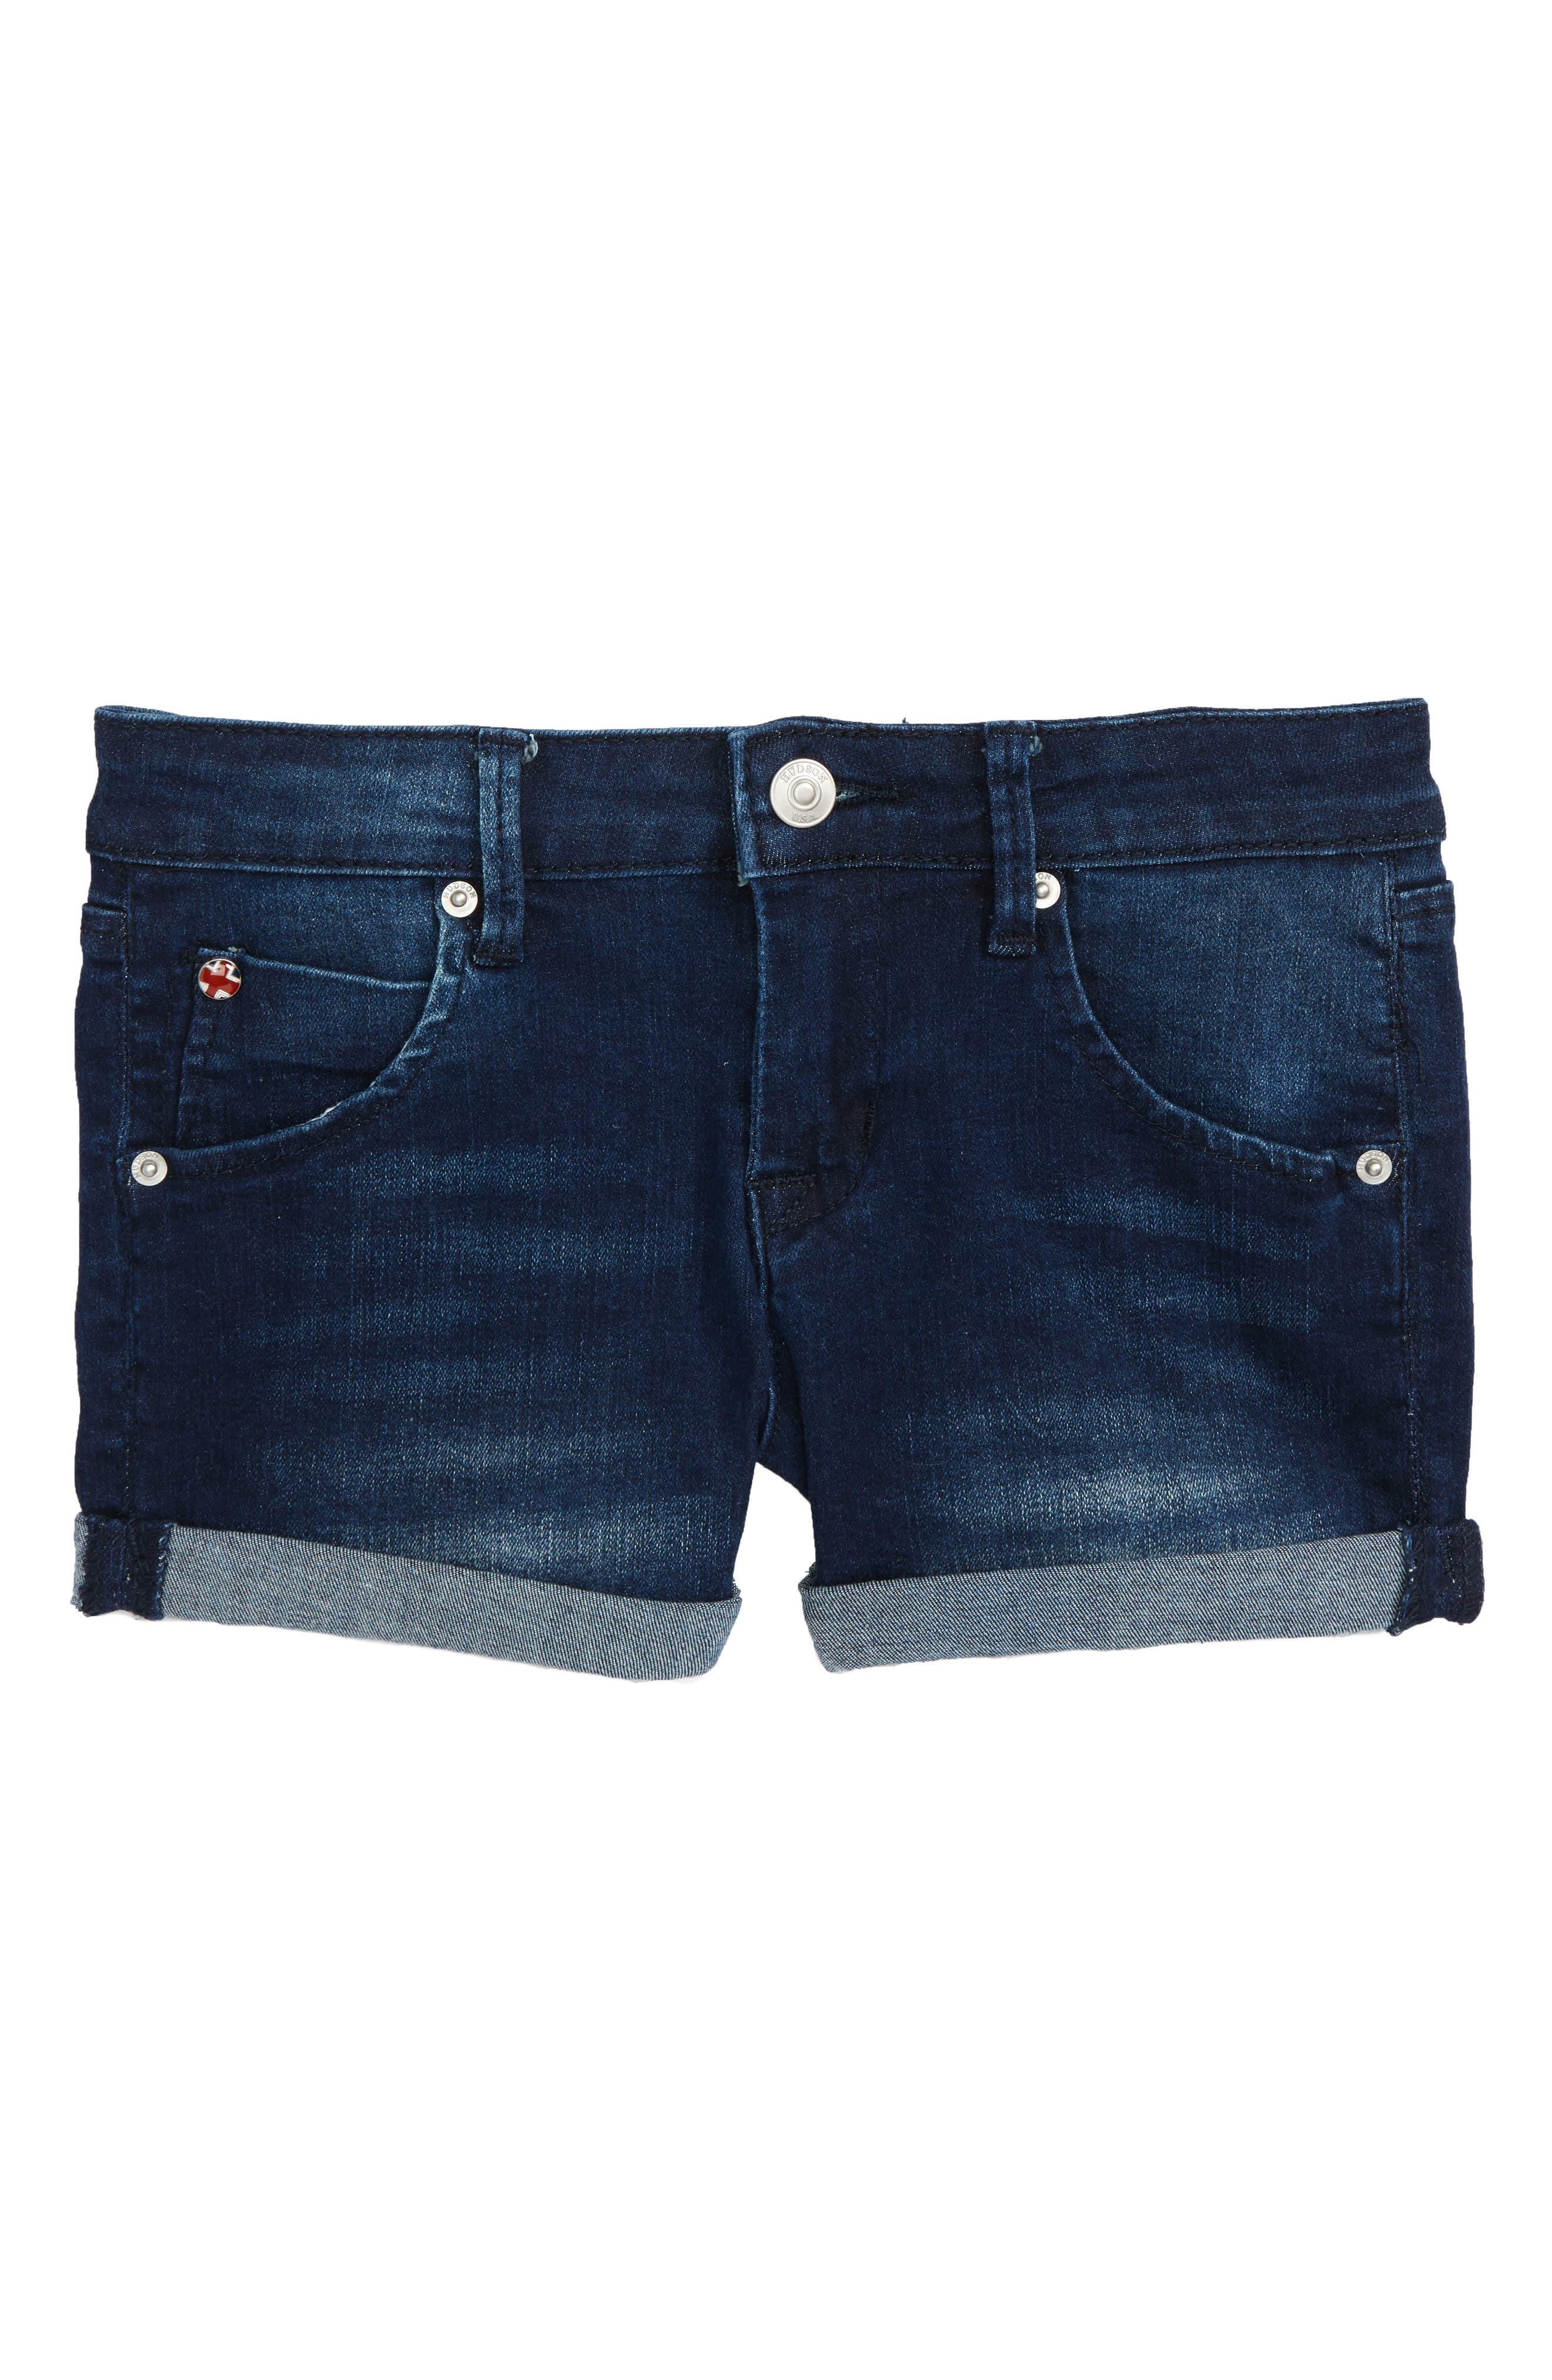 Roll Cuff Denim Shorts,                             Main thumbnail 1, color,                             Low Octane